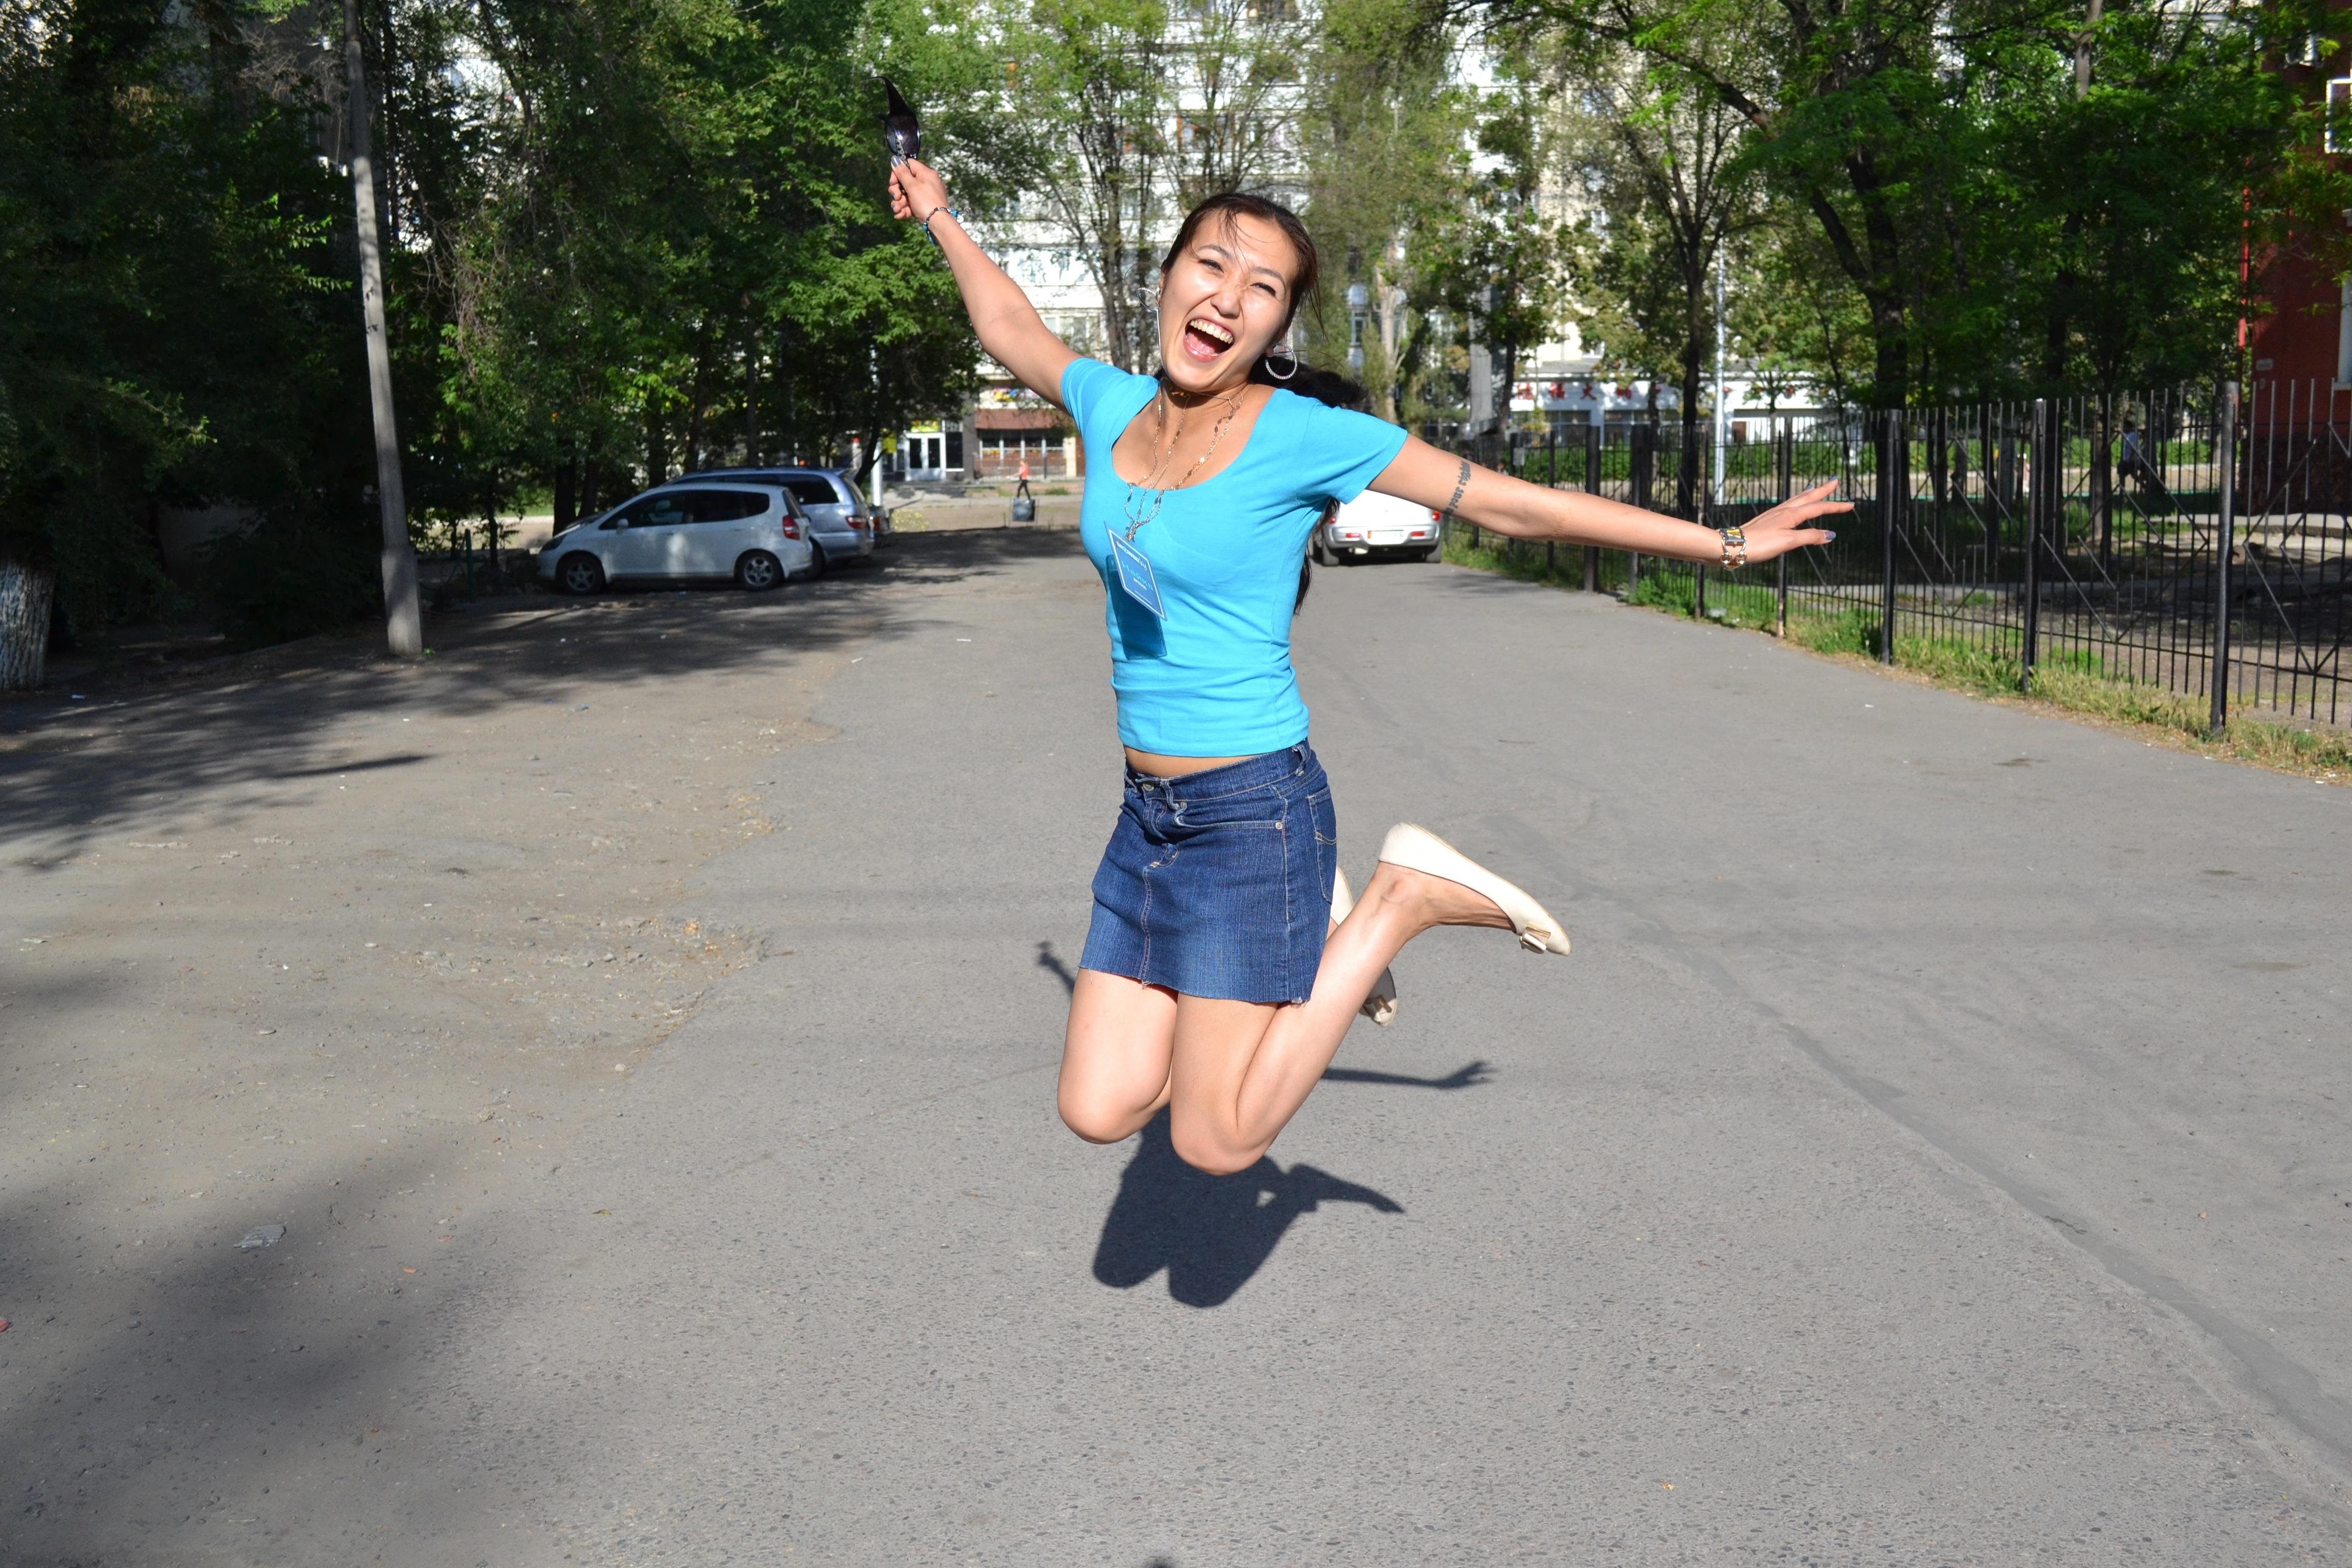 Photos Men Run Smile Fitness Two Girls athletic Sleeveless